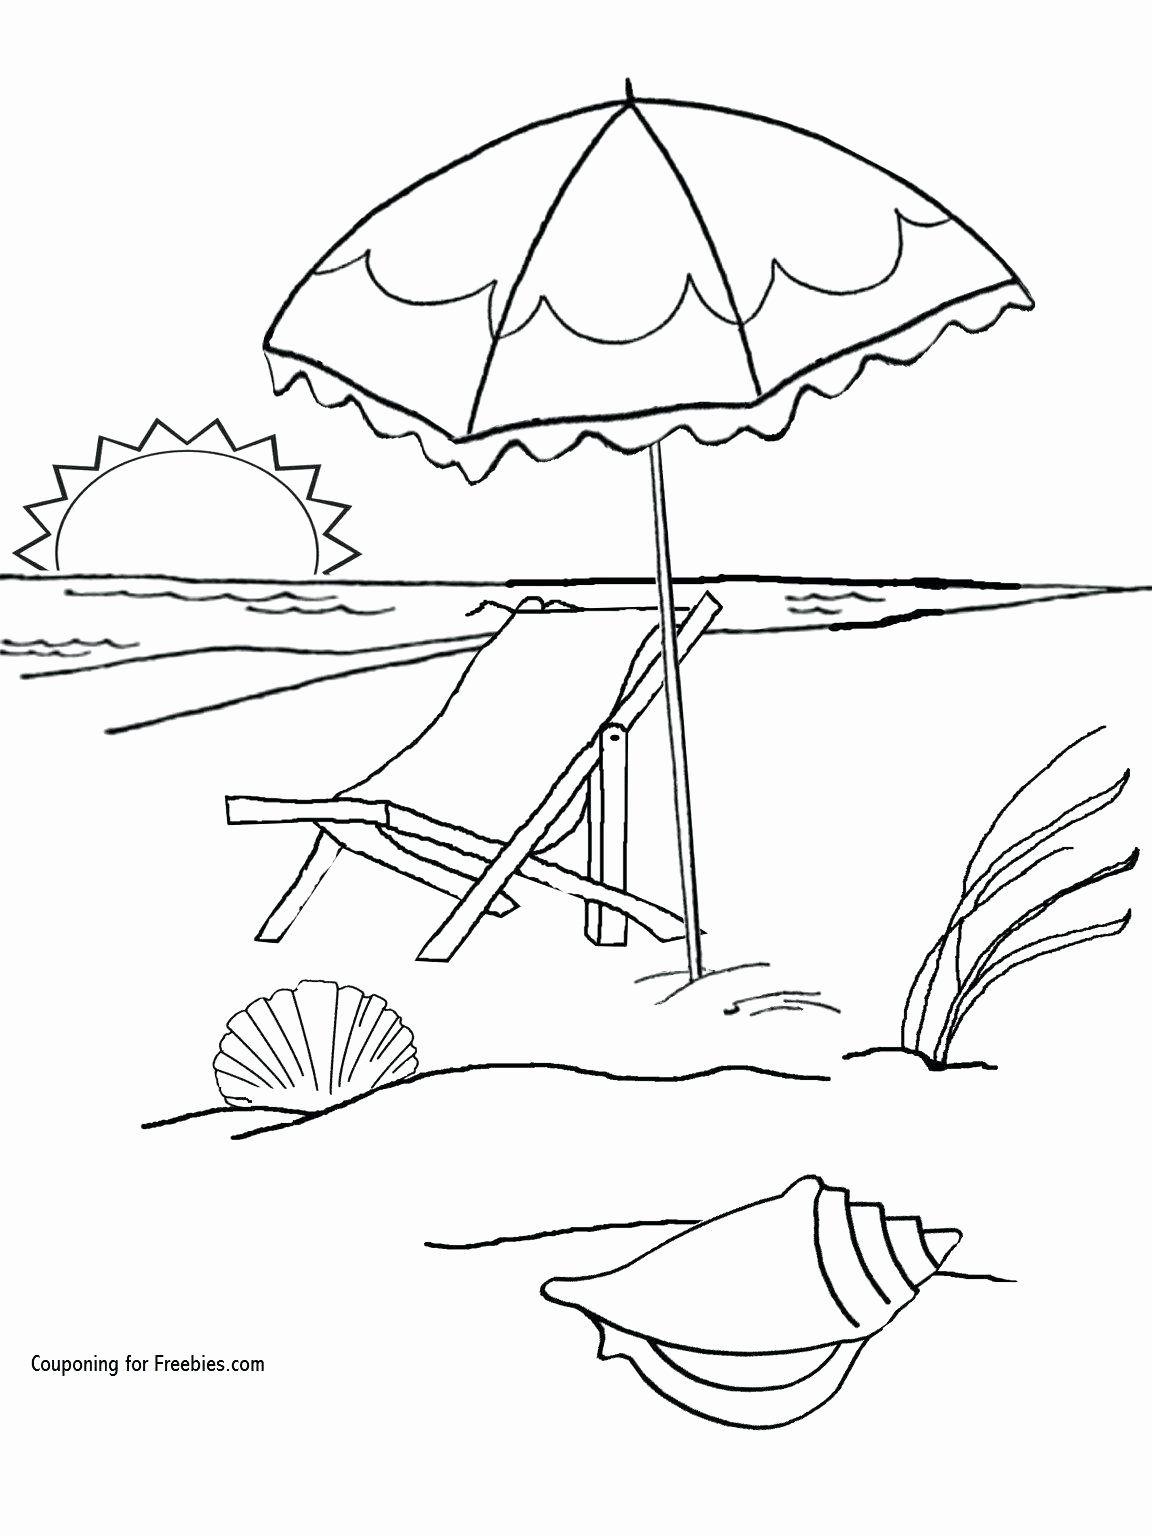 Pin By Dawn Peery On Umenie Beach Coloring Pages Cool Coloring Pages Summer Coloring Pages